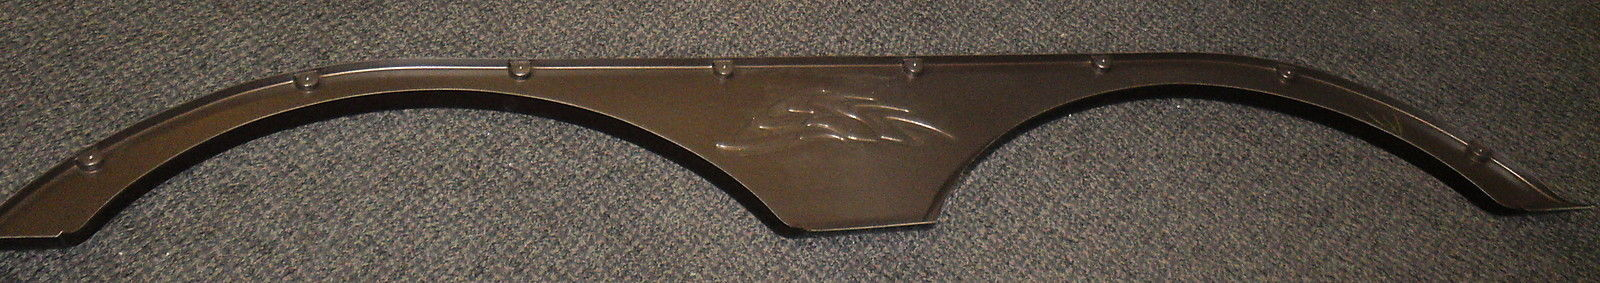 "RV Bronze Tandem Axle Fender Skirt Size: 11"" X 67"" #MTF-0105"